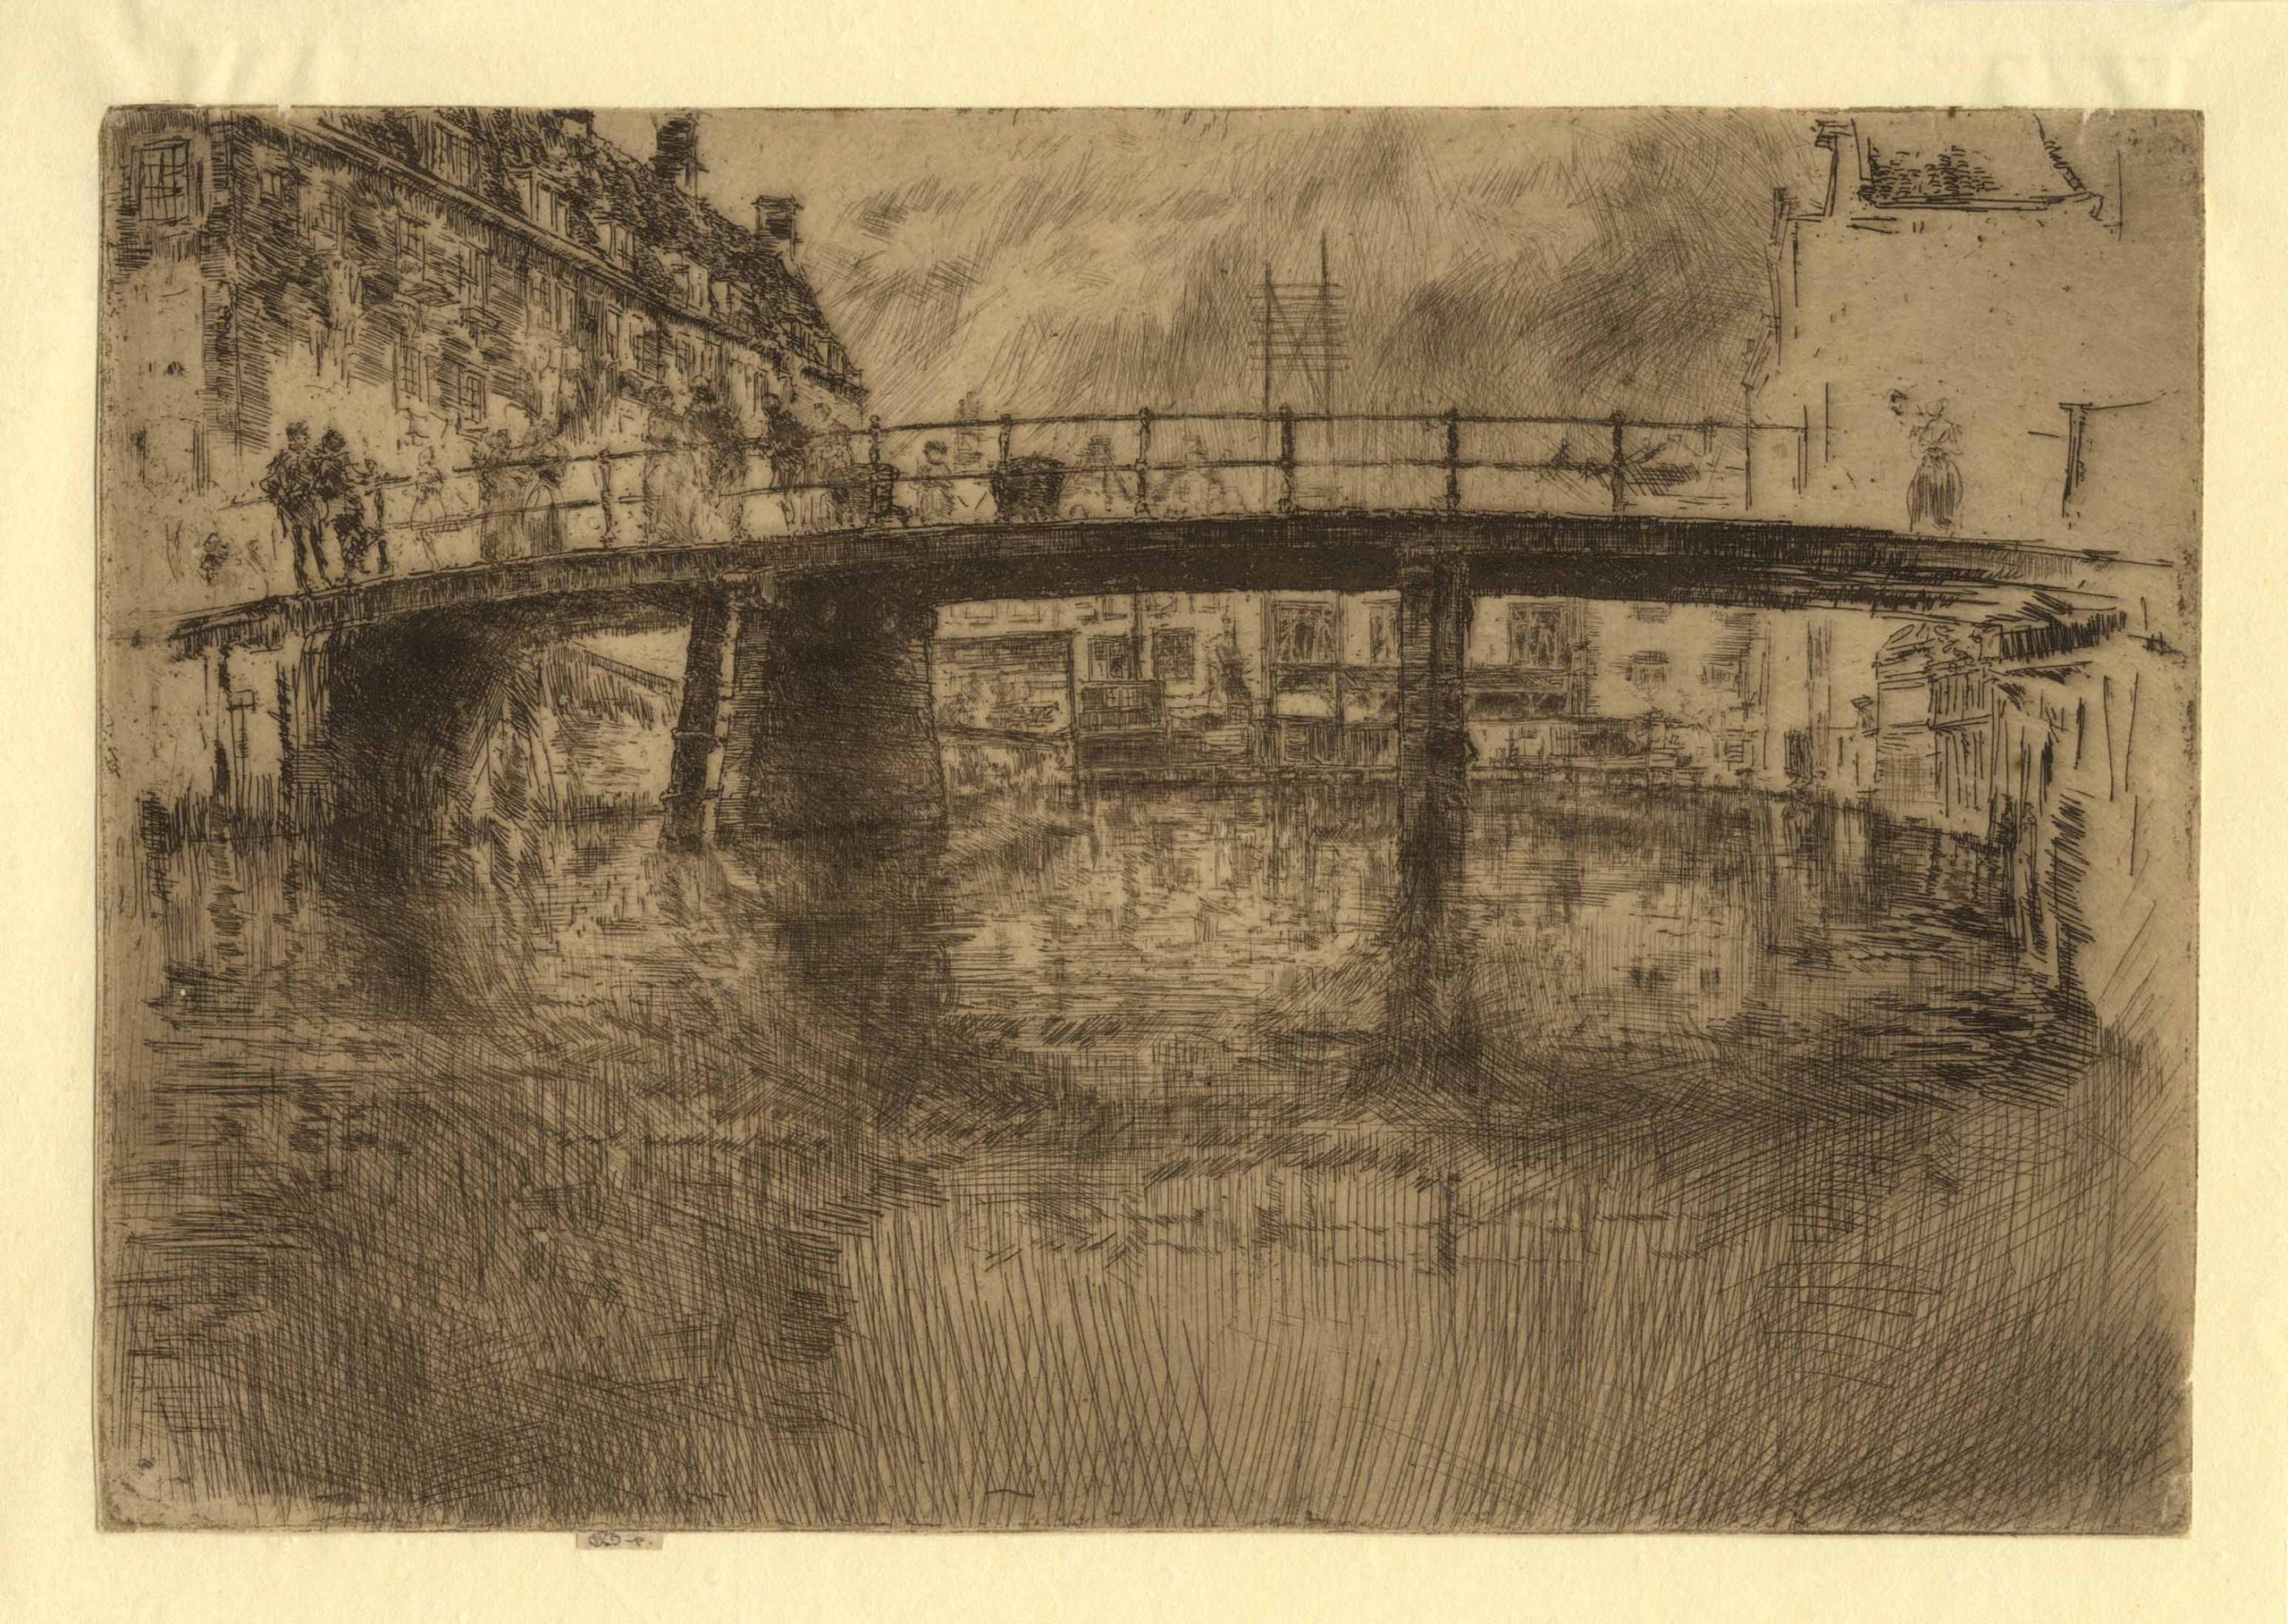 Bridge Amsterdam, final state by James Abbott McNeill Whistler